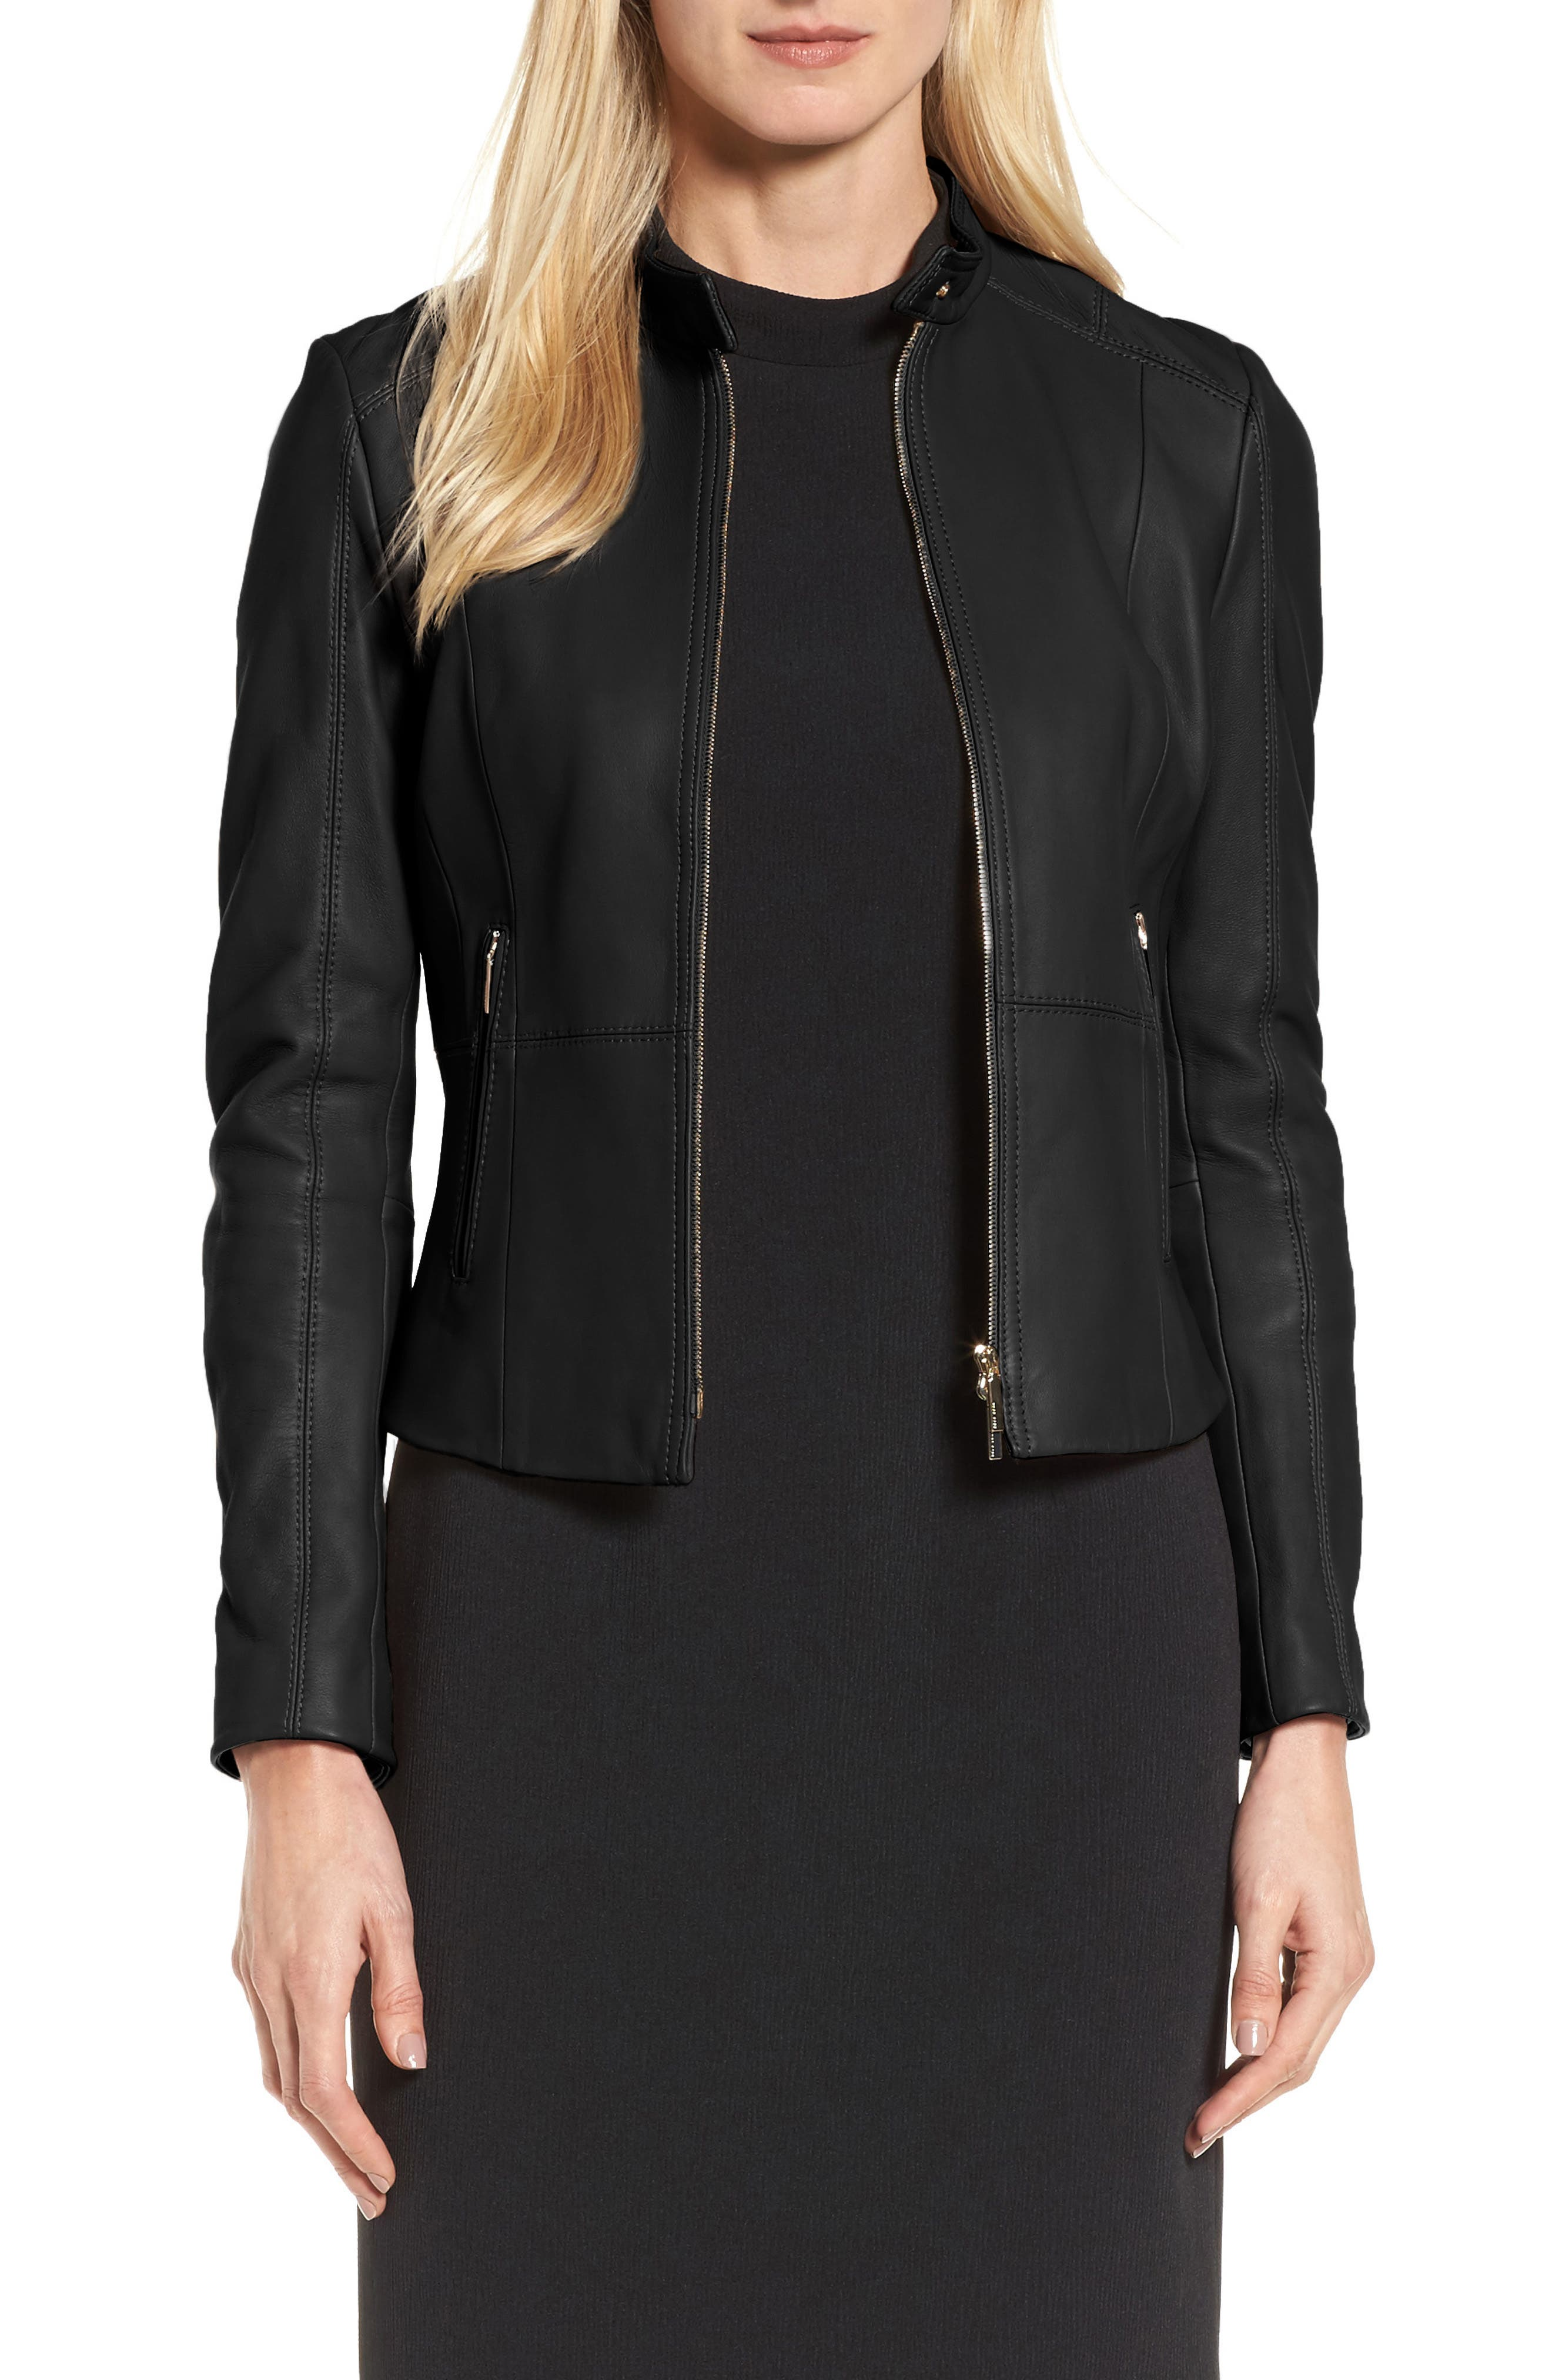 Sammonaie Leather Jacket,                         Main,                         color, 001